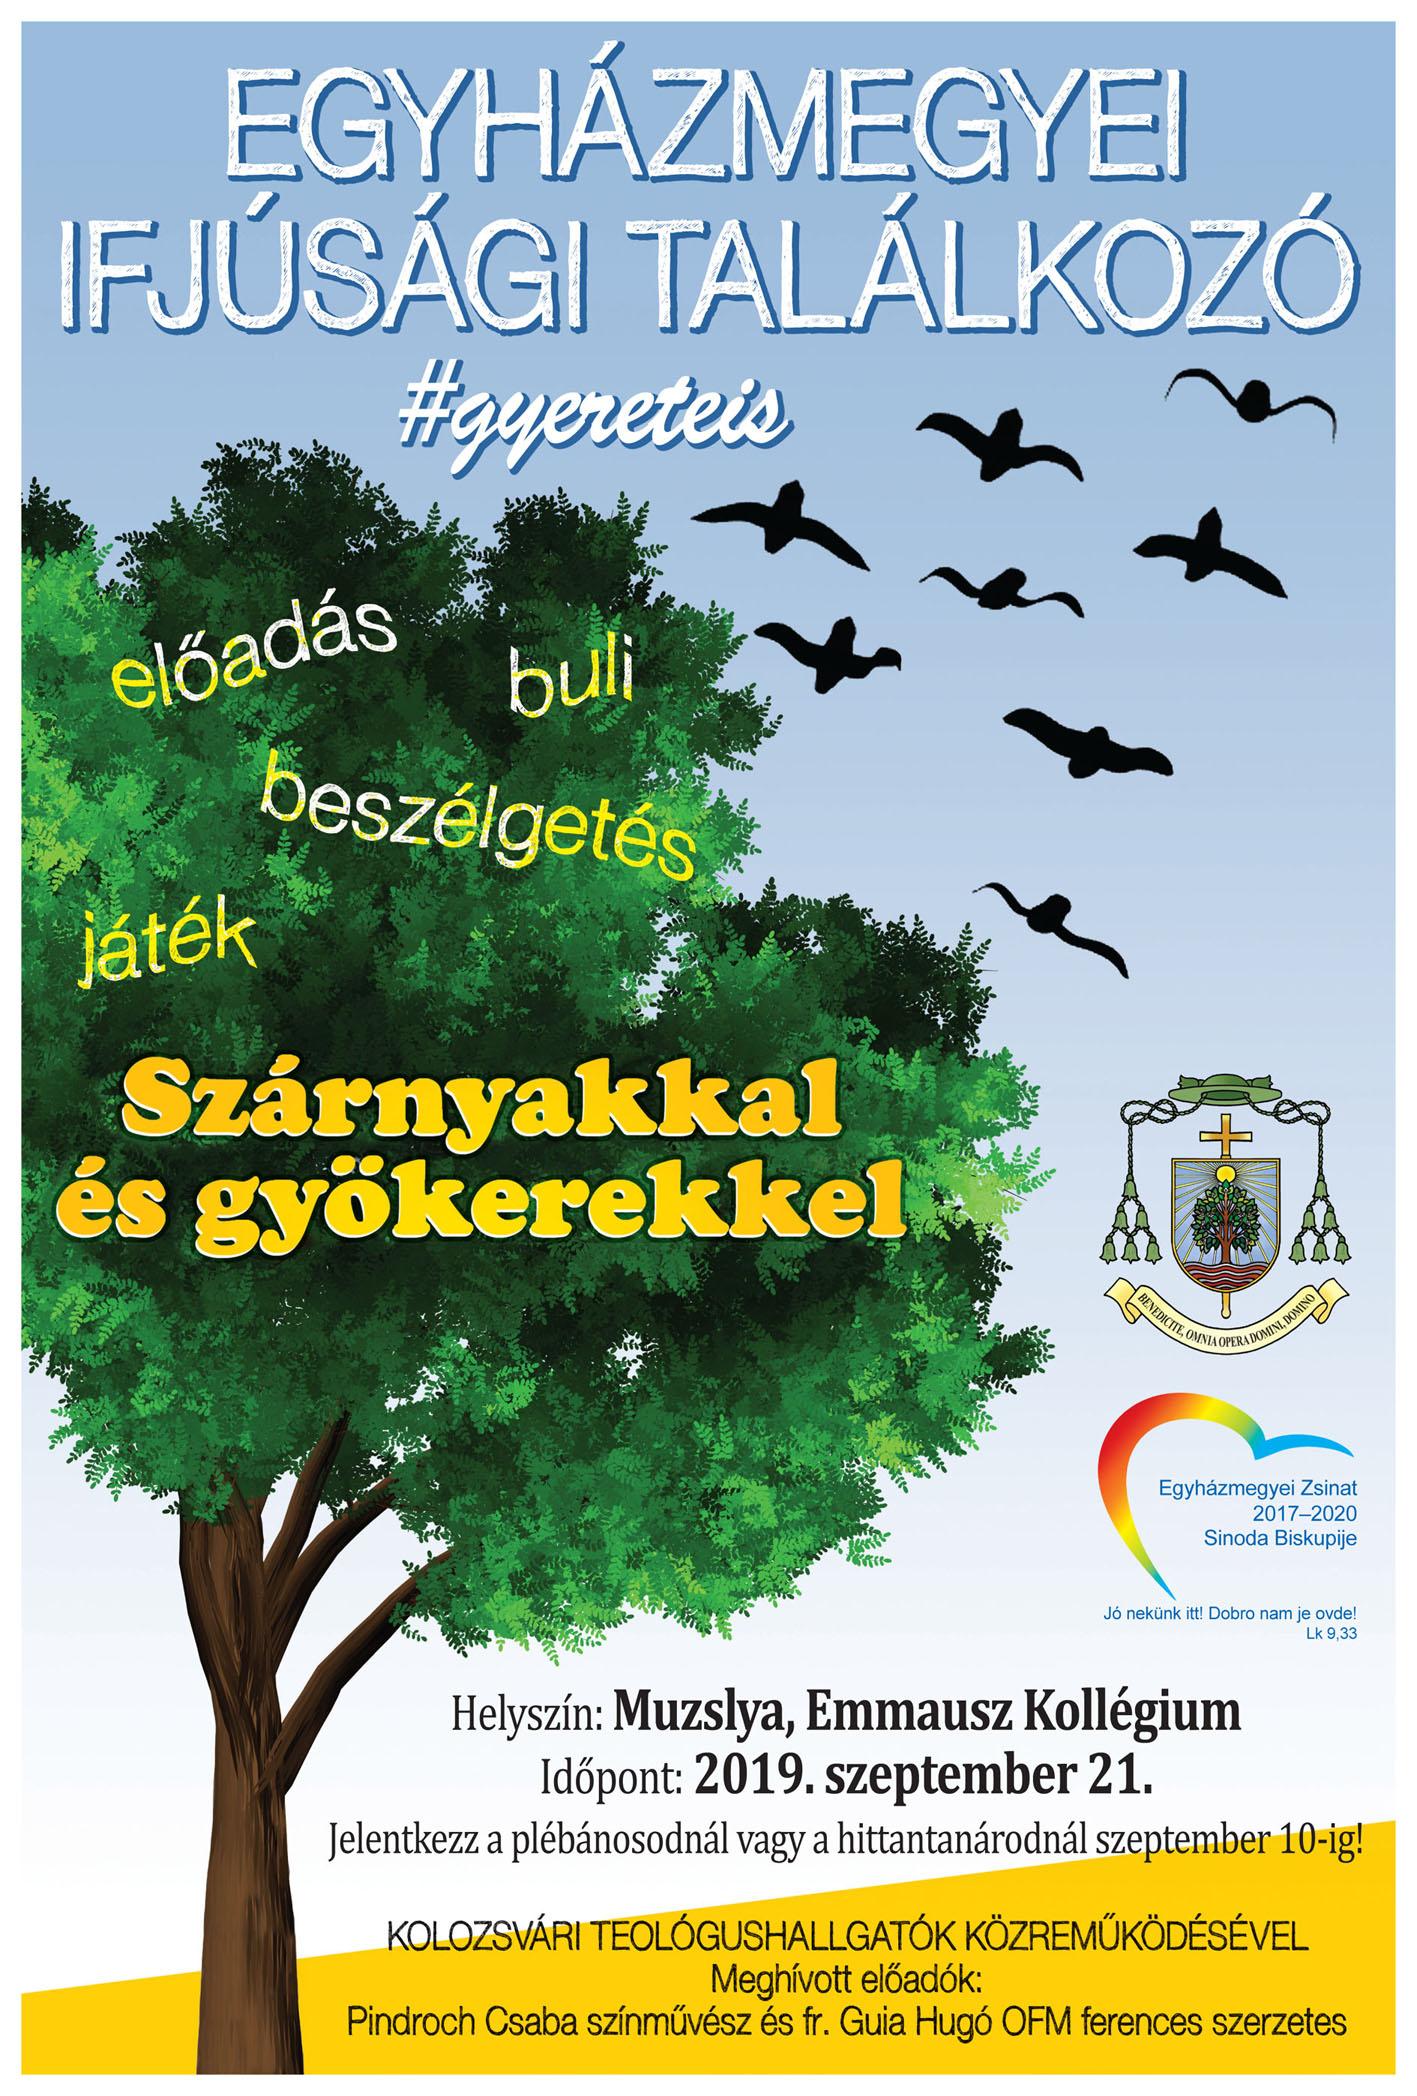 ifjusagi-talalkozo-plakat